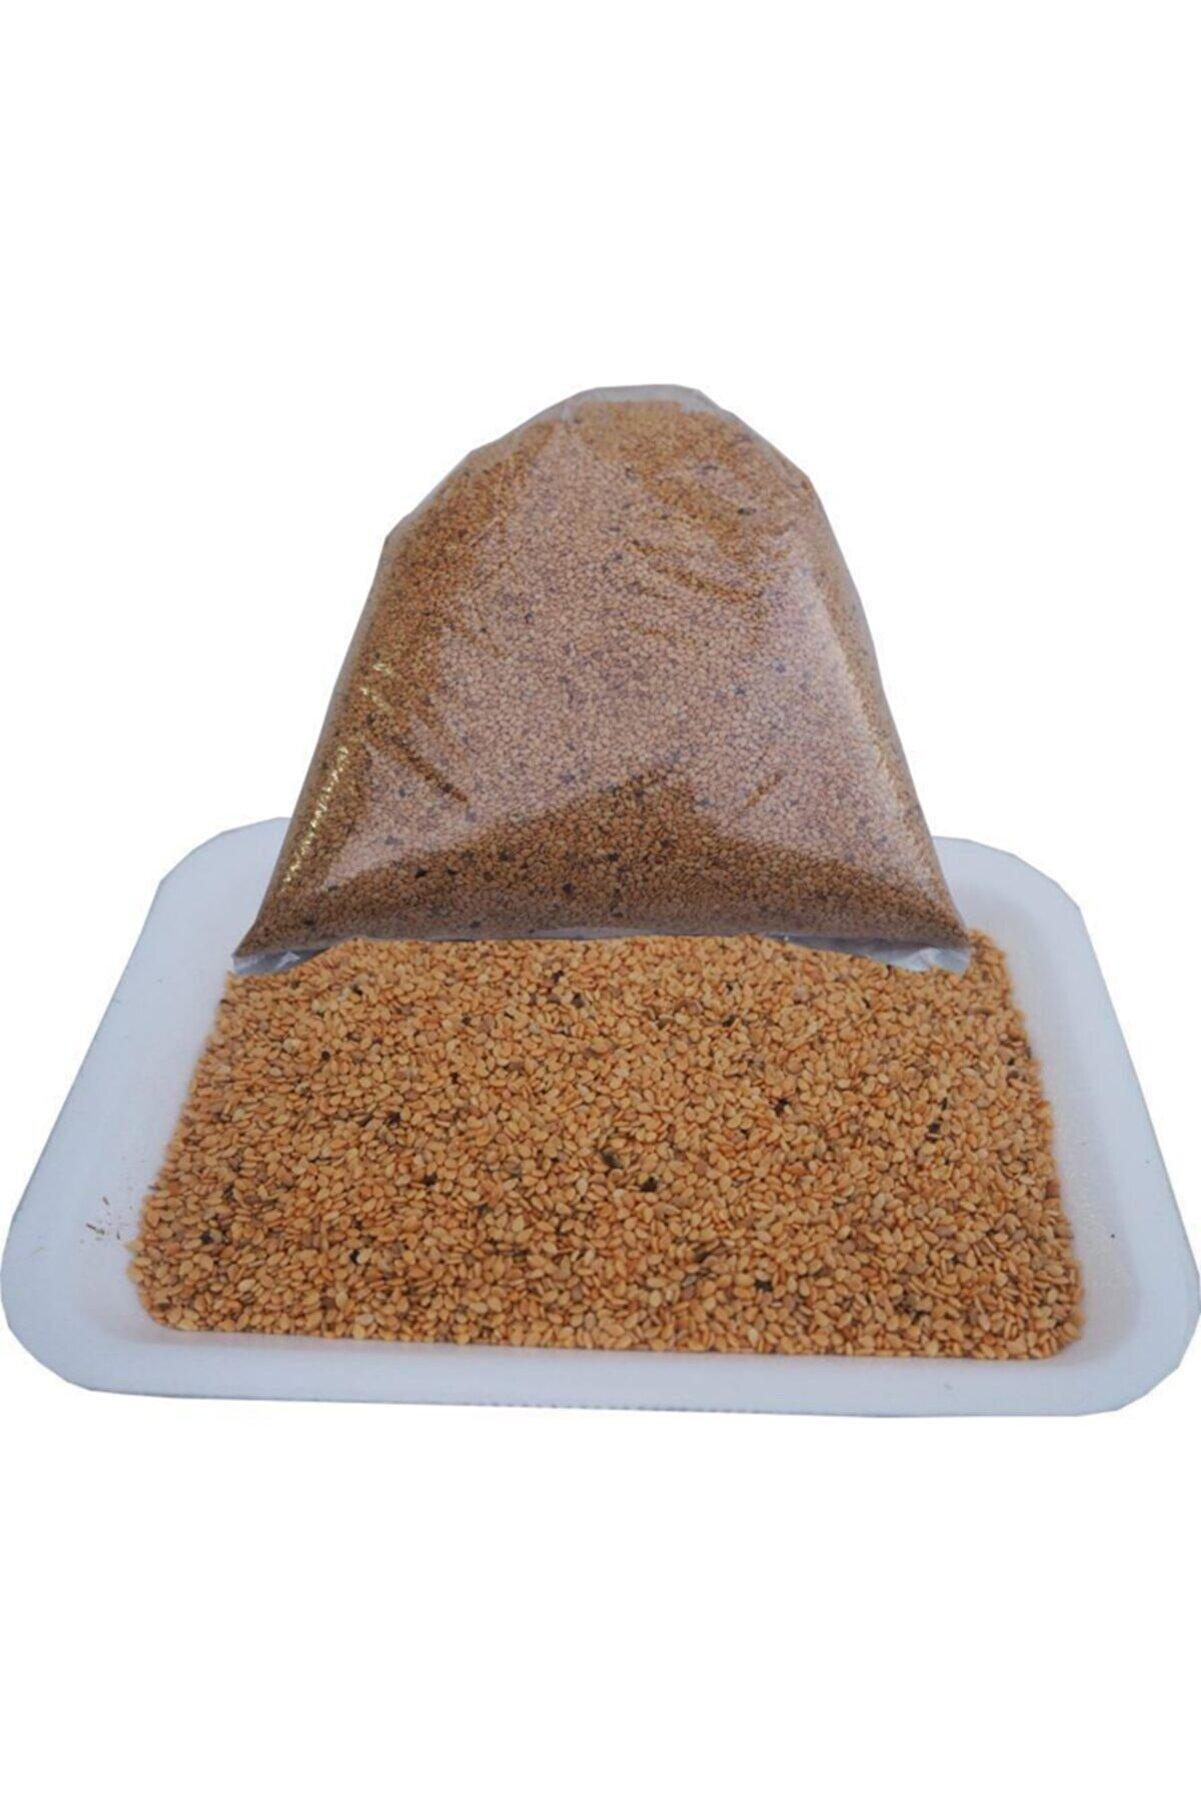 Kalaycıoğlu Kavrulmuş Susam 500 gr